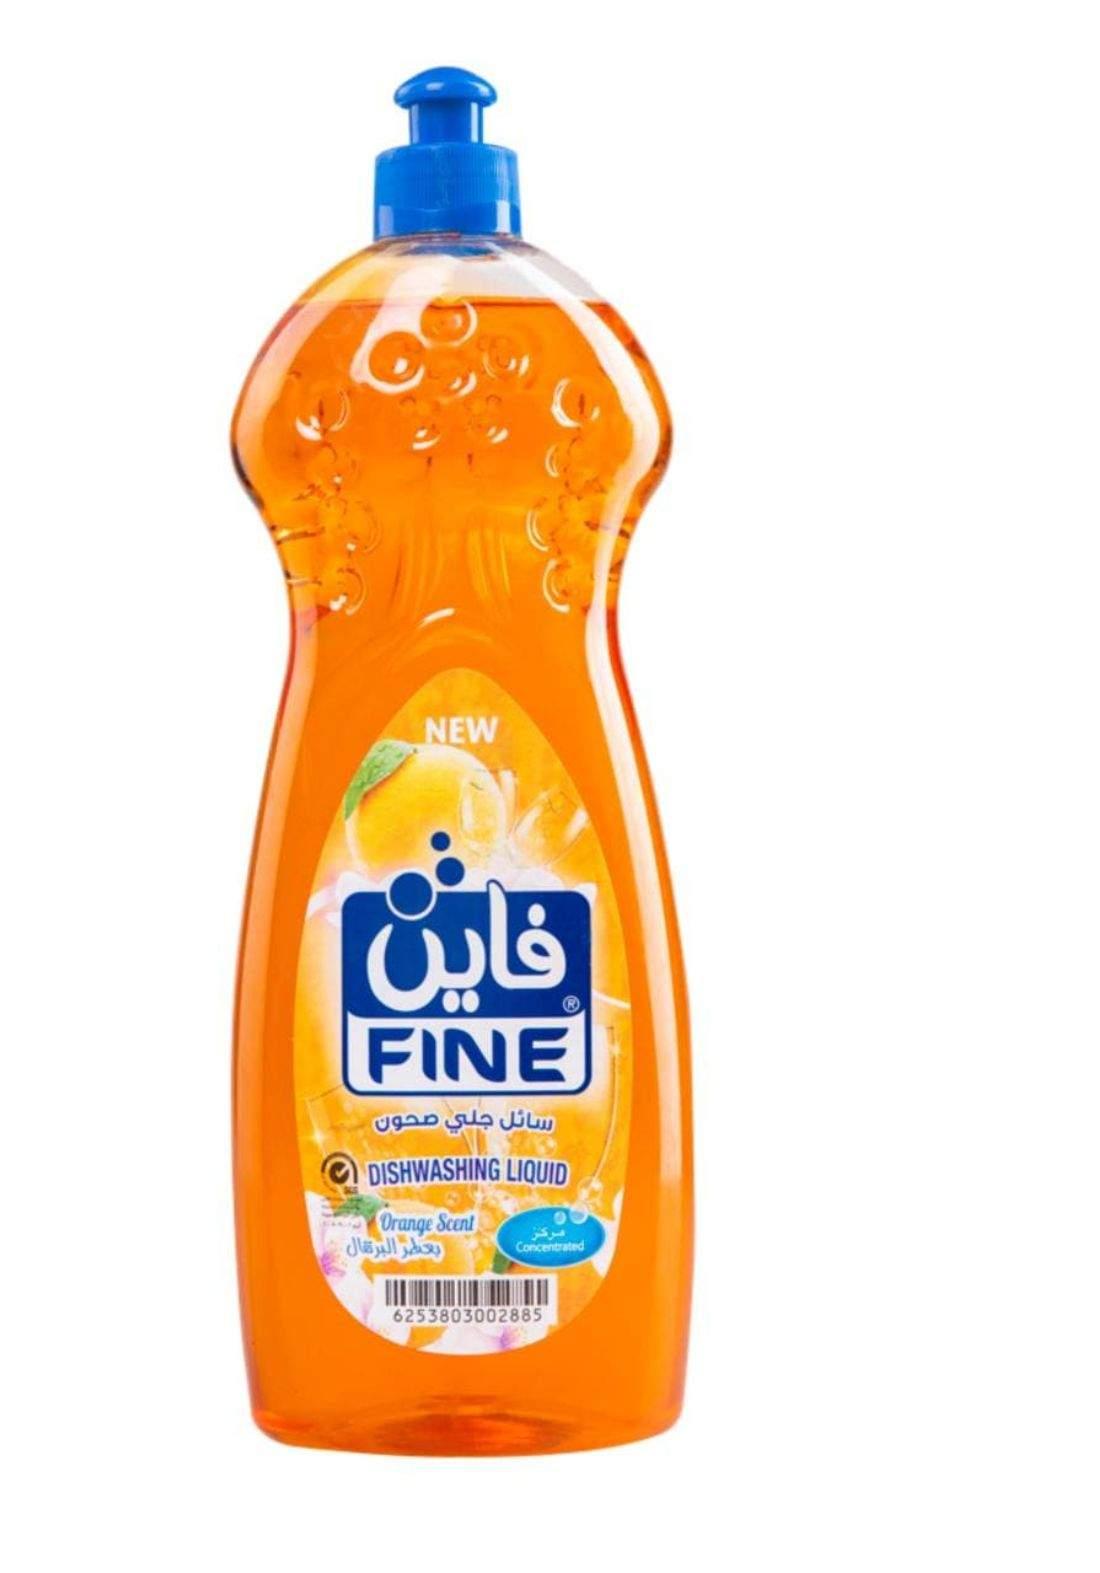 Fine dishwashing liquid 750ml فاين سائل غسيل الصحون